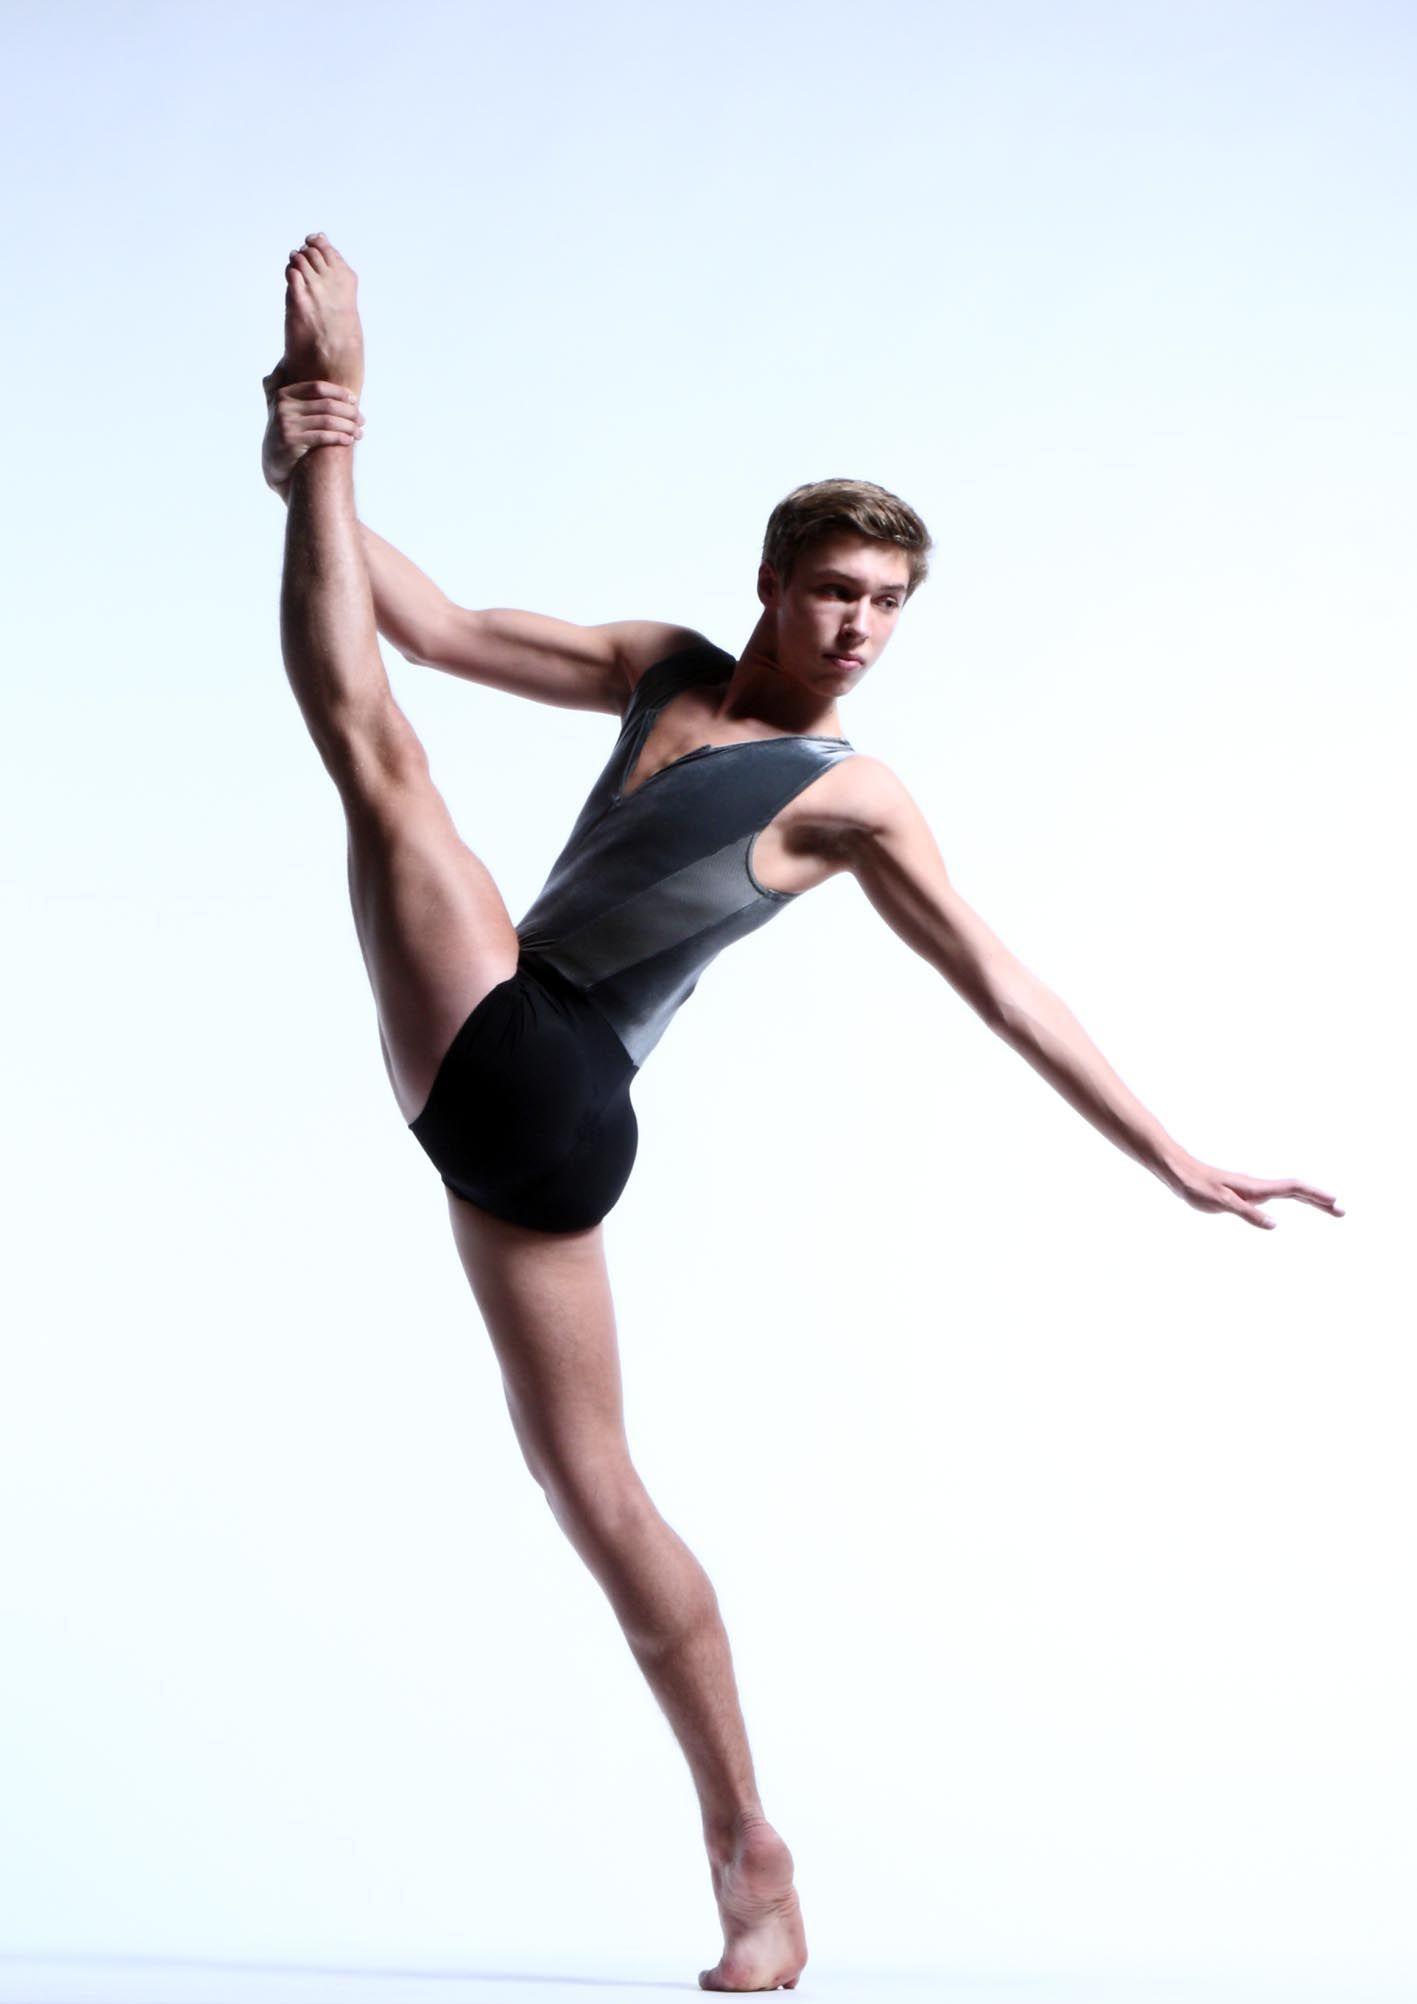 Boy ballet dancers in gay anal sex i